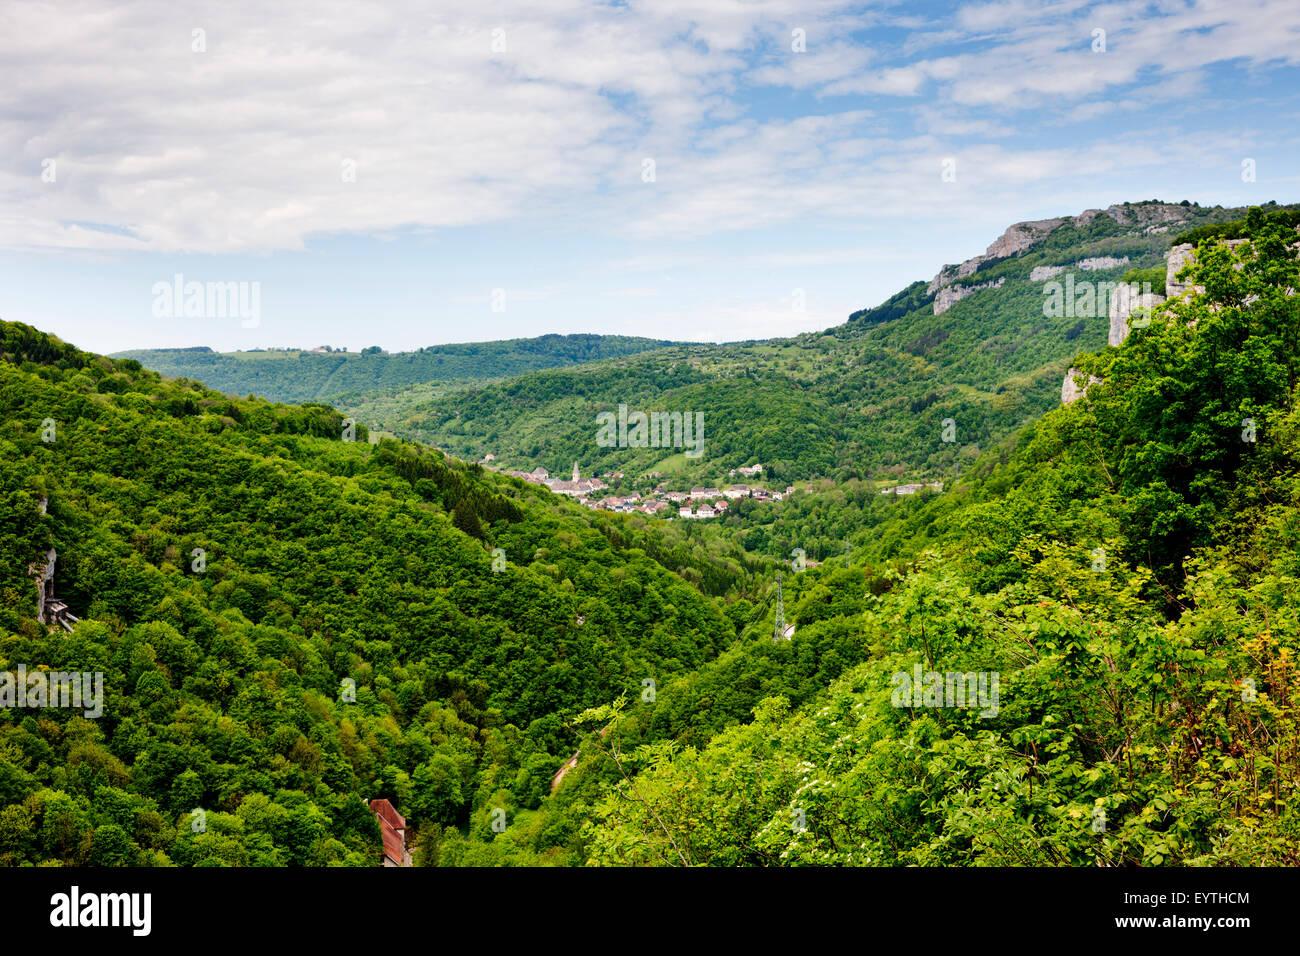 Loue valley near Mouthier-Haute-Pierre - Stock Image